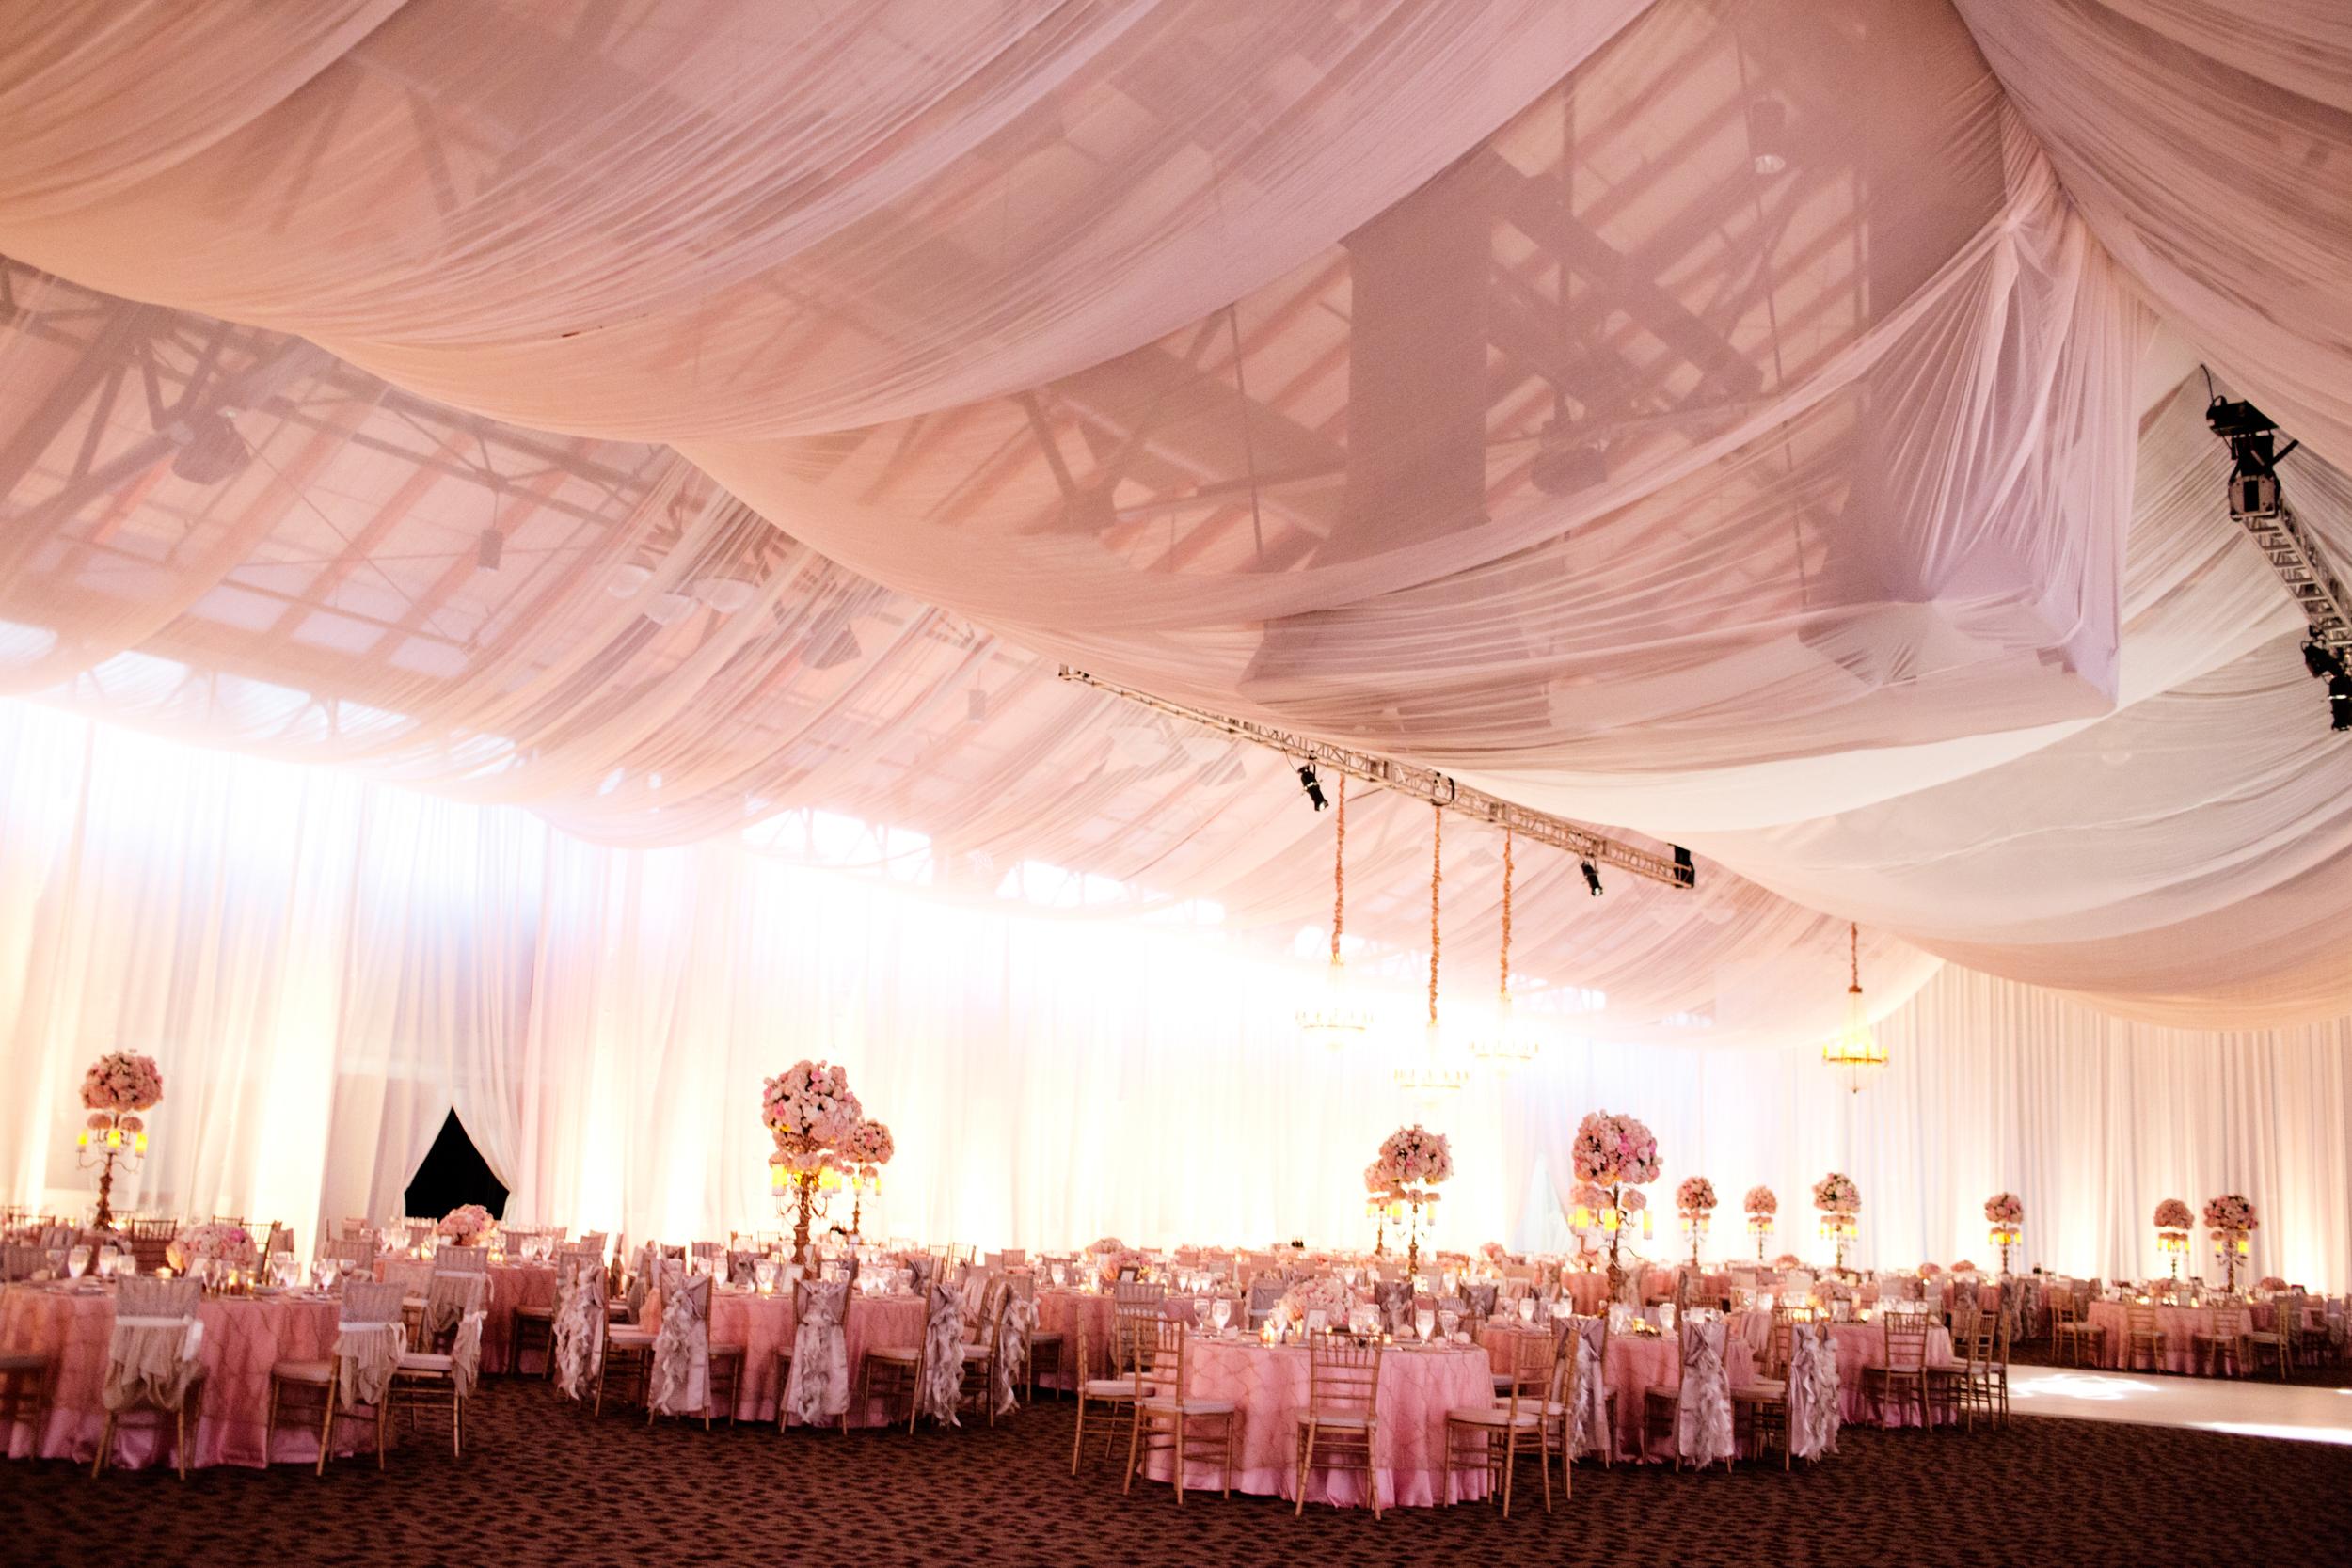 Ceci_New_York_Ceci_Style_Ceci_Johnson_Luxury_Lifestyle_Floral_Lace_Wedding_Letterpress_Inspiration_Design_Custom_Couture_Personalized_Invitations_-68.jpg